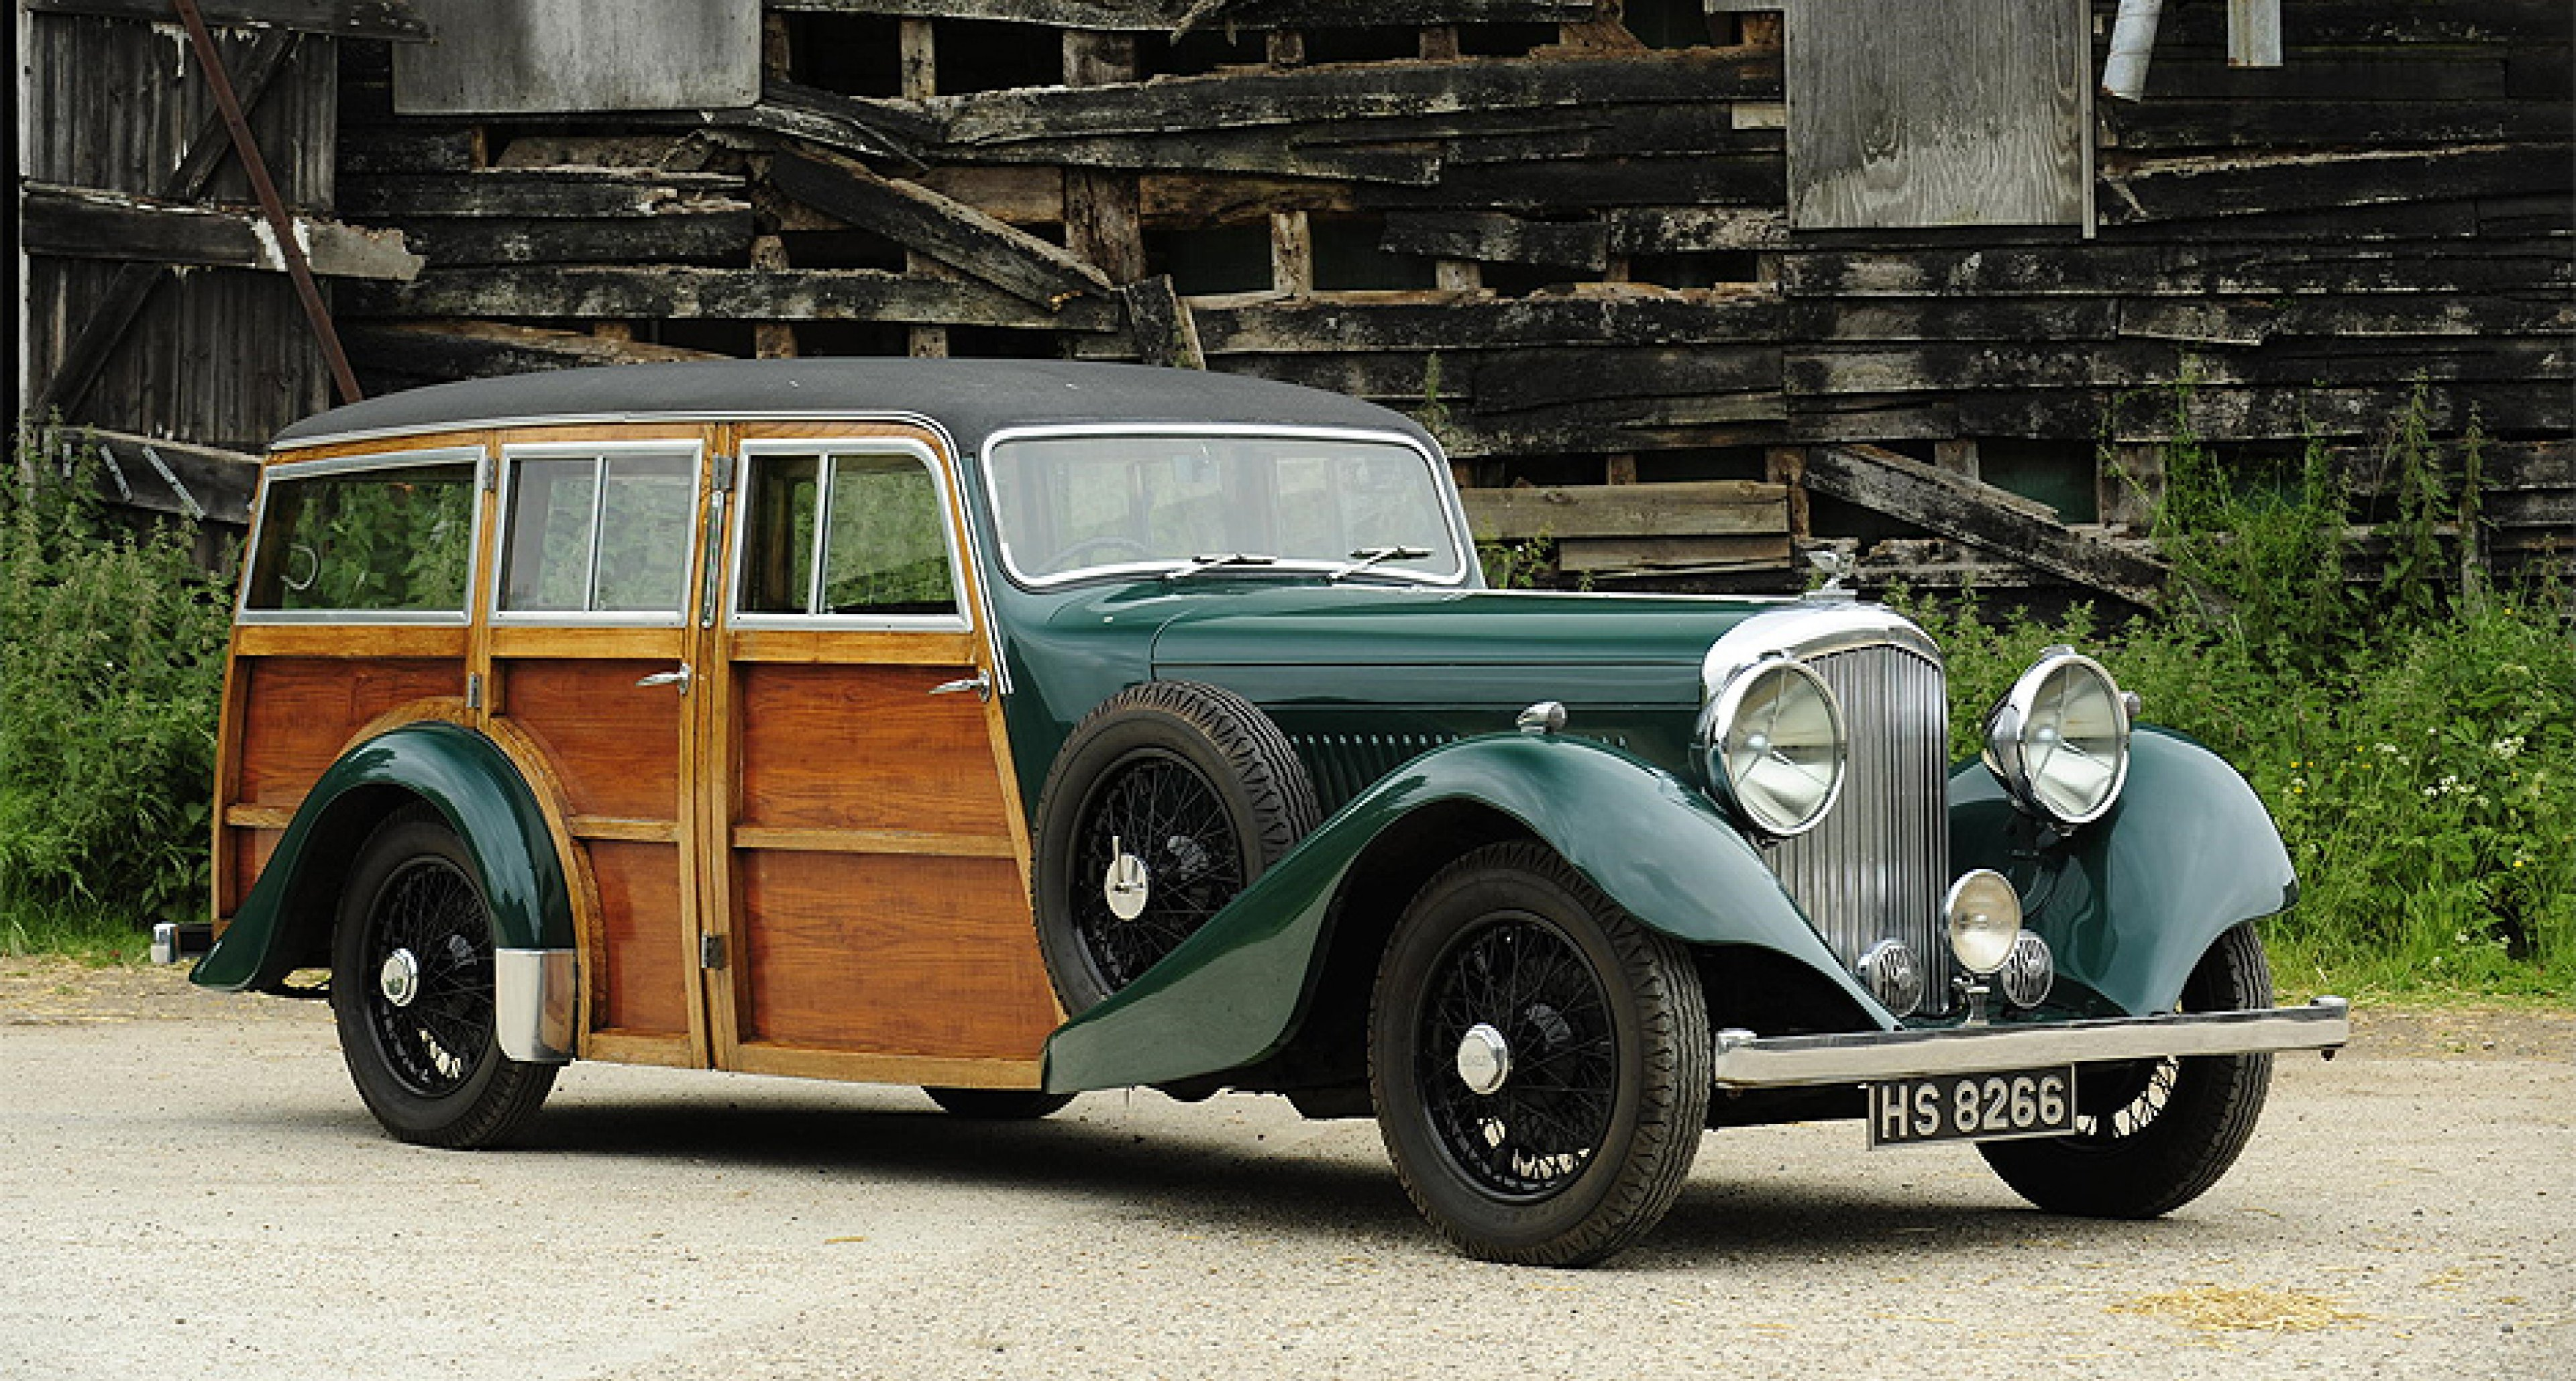 1935 Bentley 3½ Litre Shooting Brake (GBP 70,000 - 90,000)